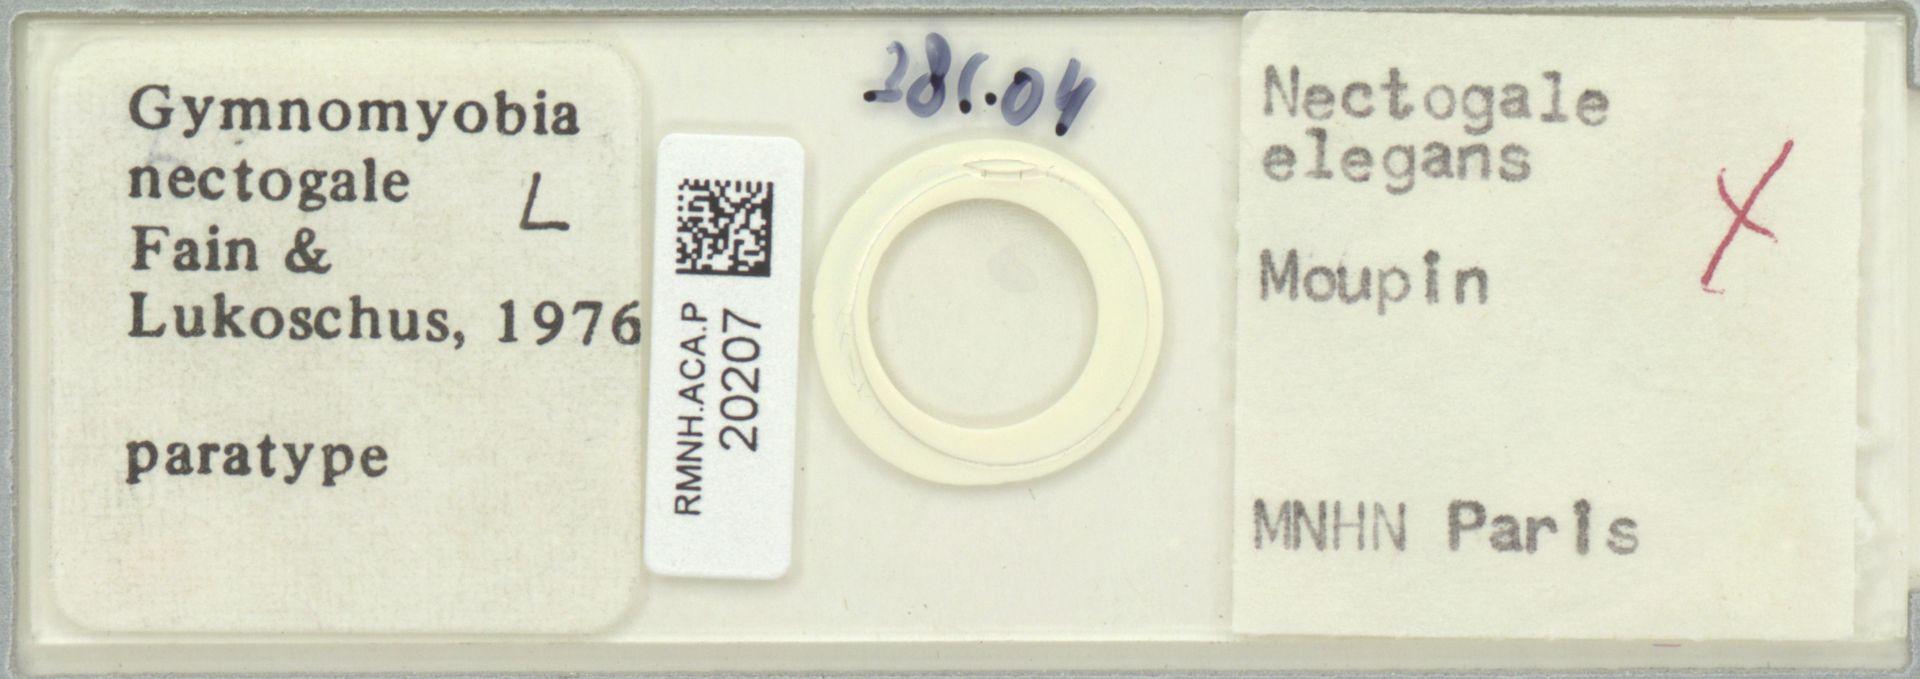 RMNH.ACA.P.20207   Gymnomyobia nectogale